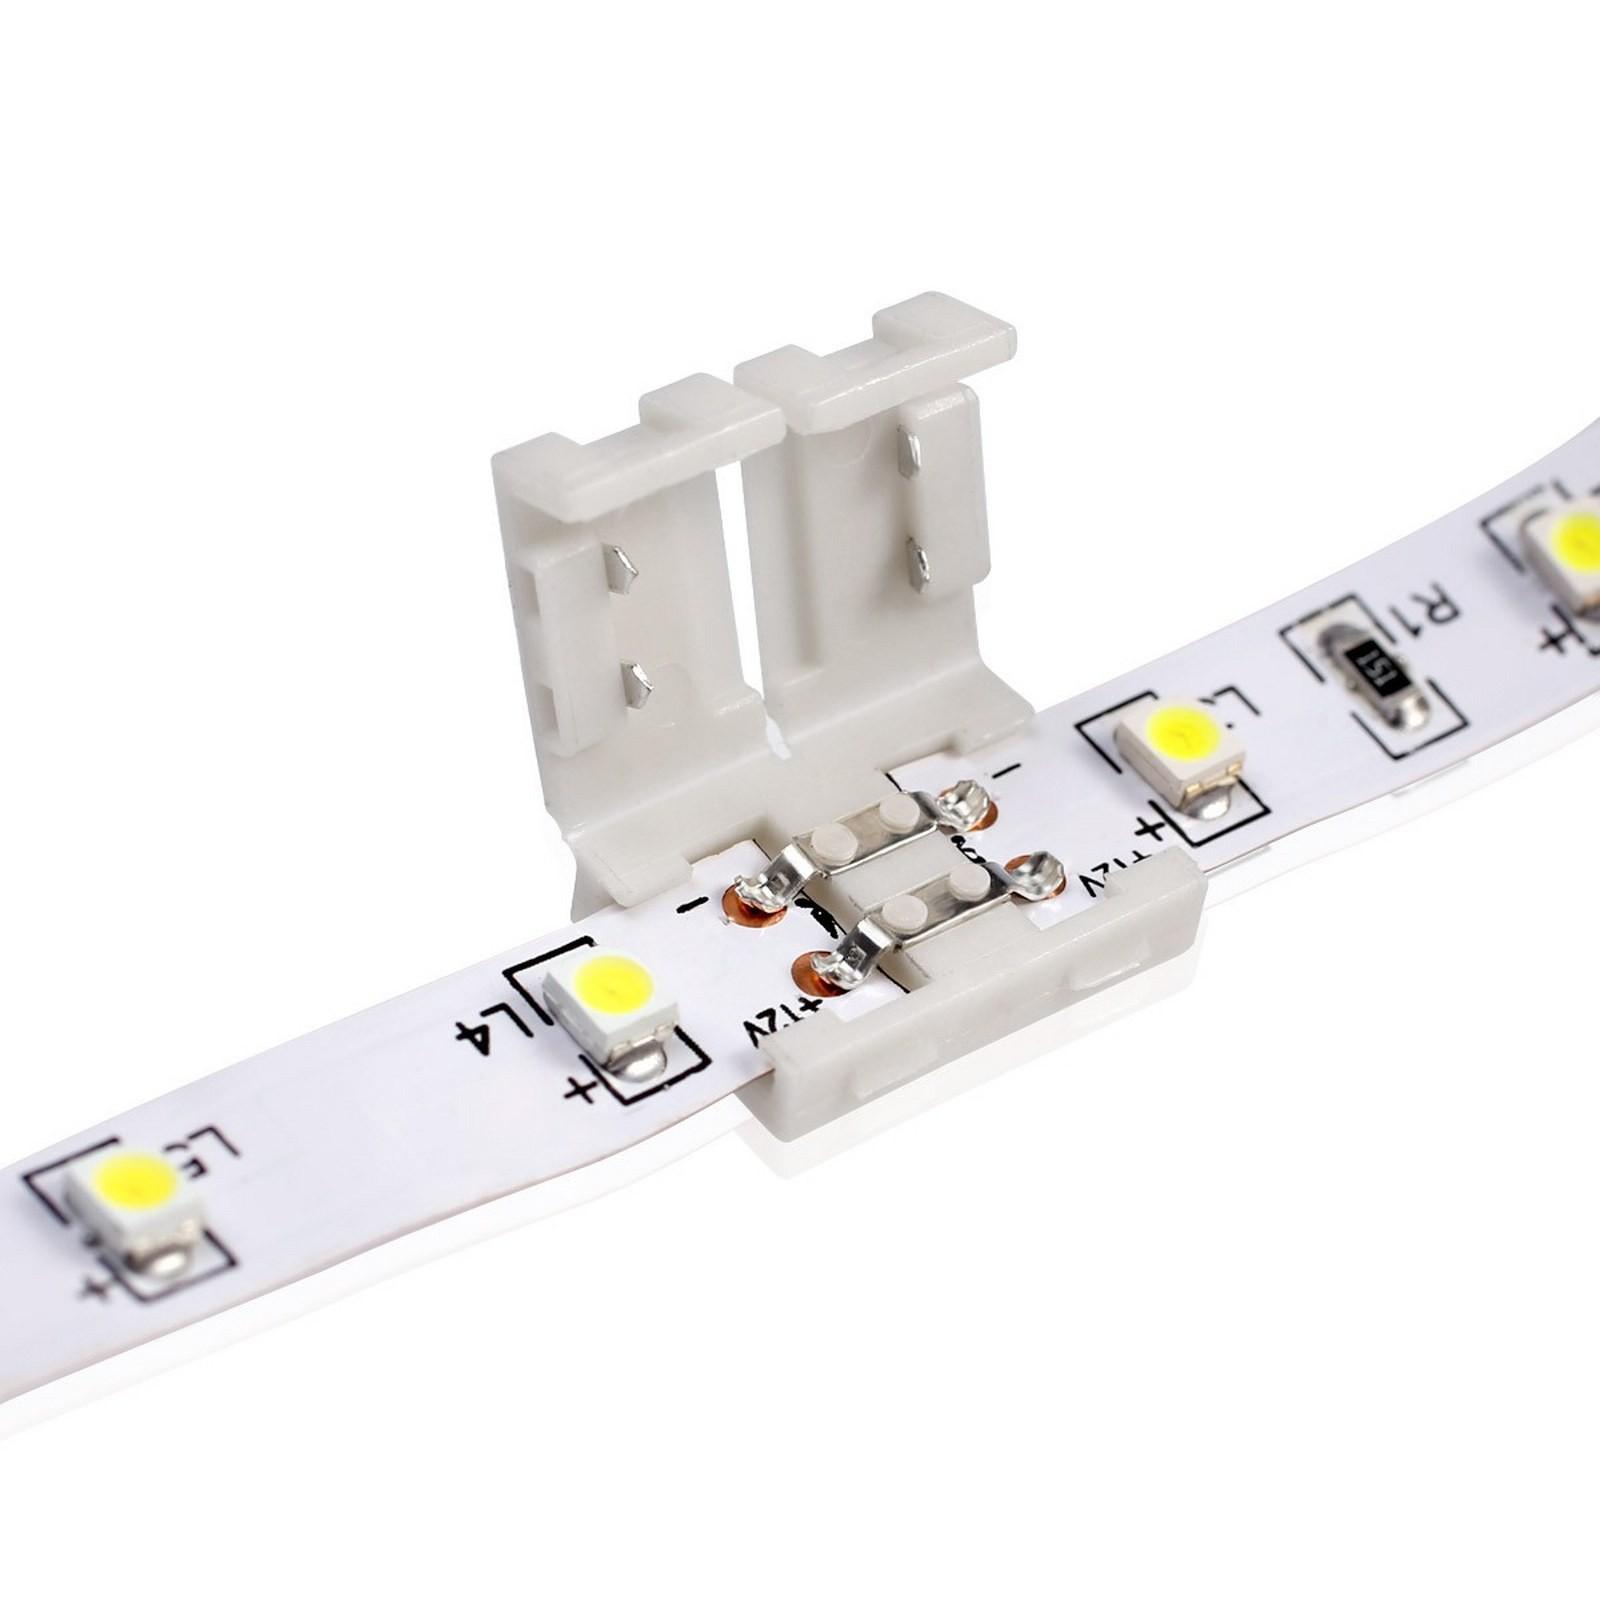 Giunto connettore strisce striscia strip led 3528 life pcb for Led a strisce